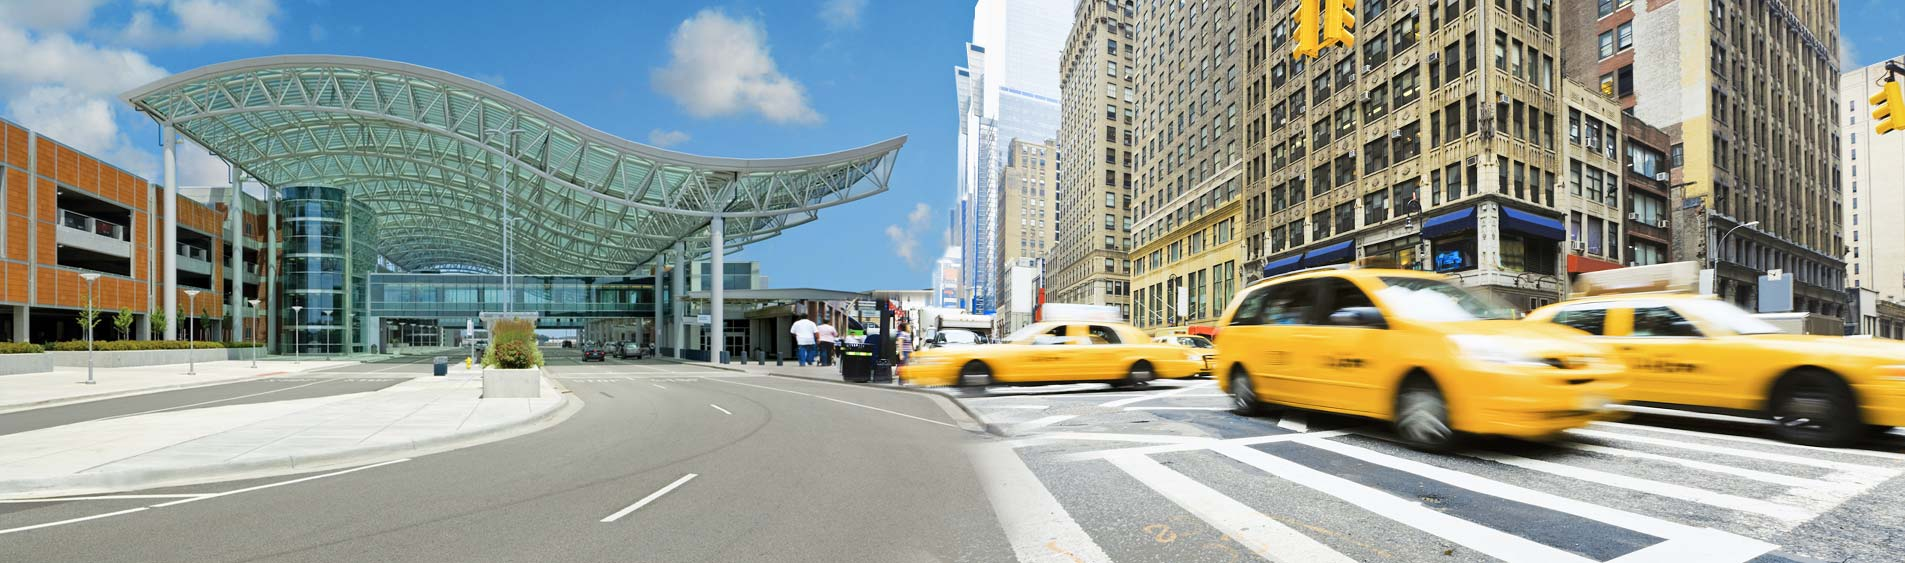 Home-_image_NYC